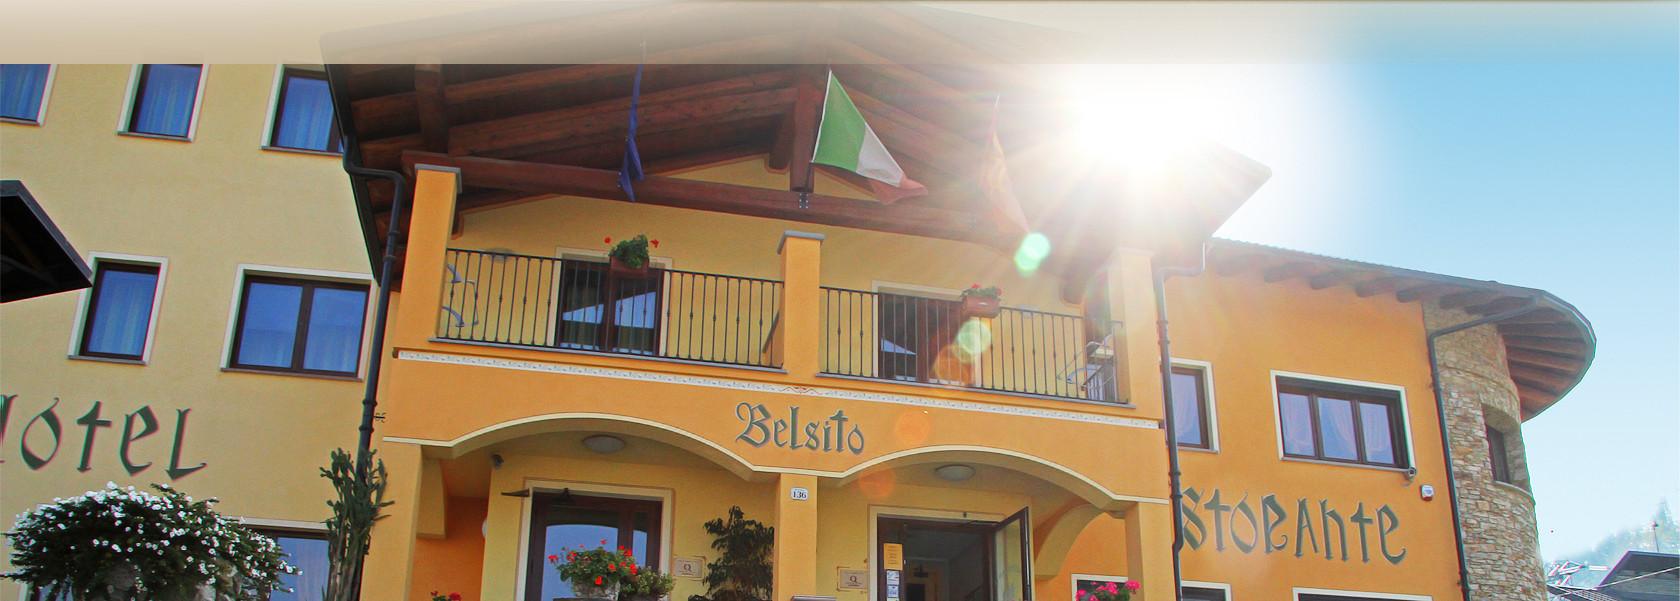 Hotel  Stelle Cuneo